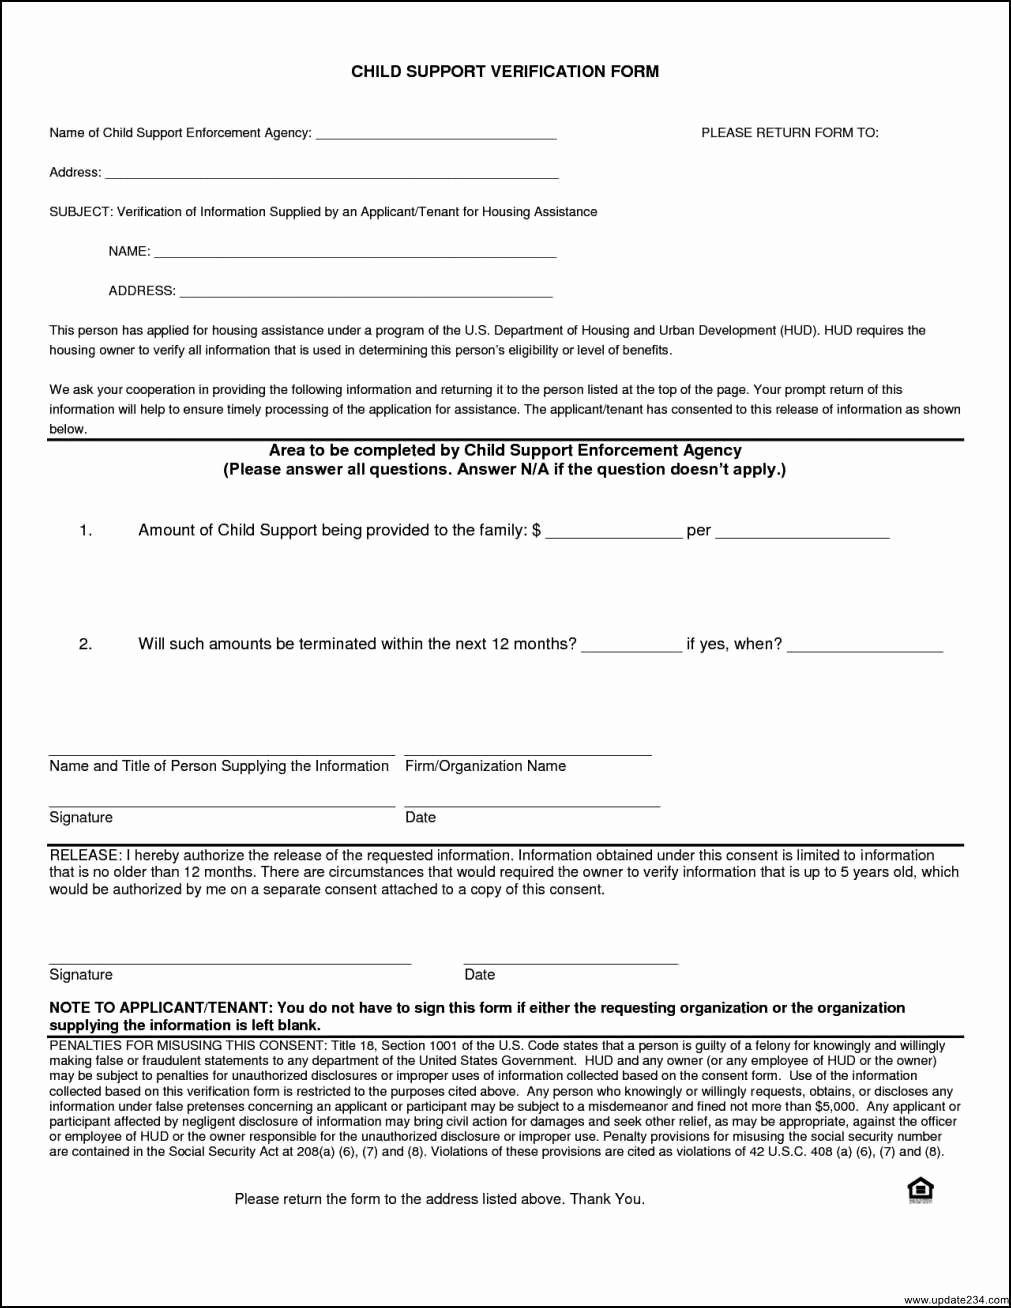 Child Support Agreement Template Elegant Voluntary Custody Agreement Form Fast Voluntary Child Child Support Support Letter Rental Agreement Templates